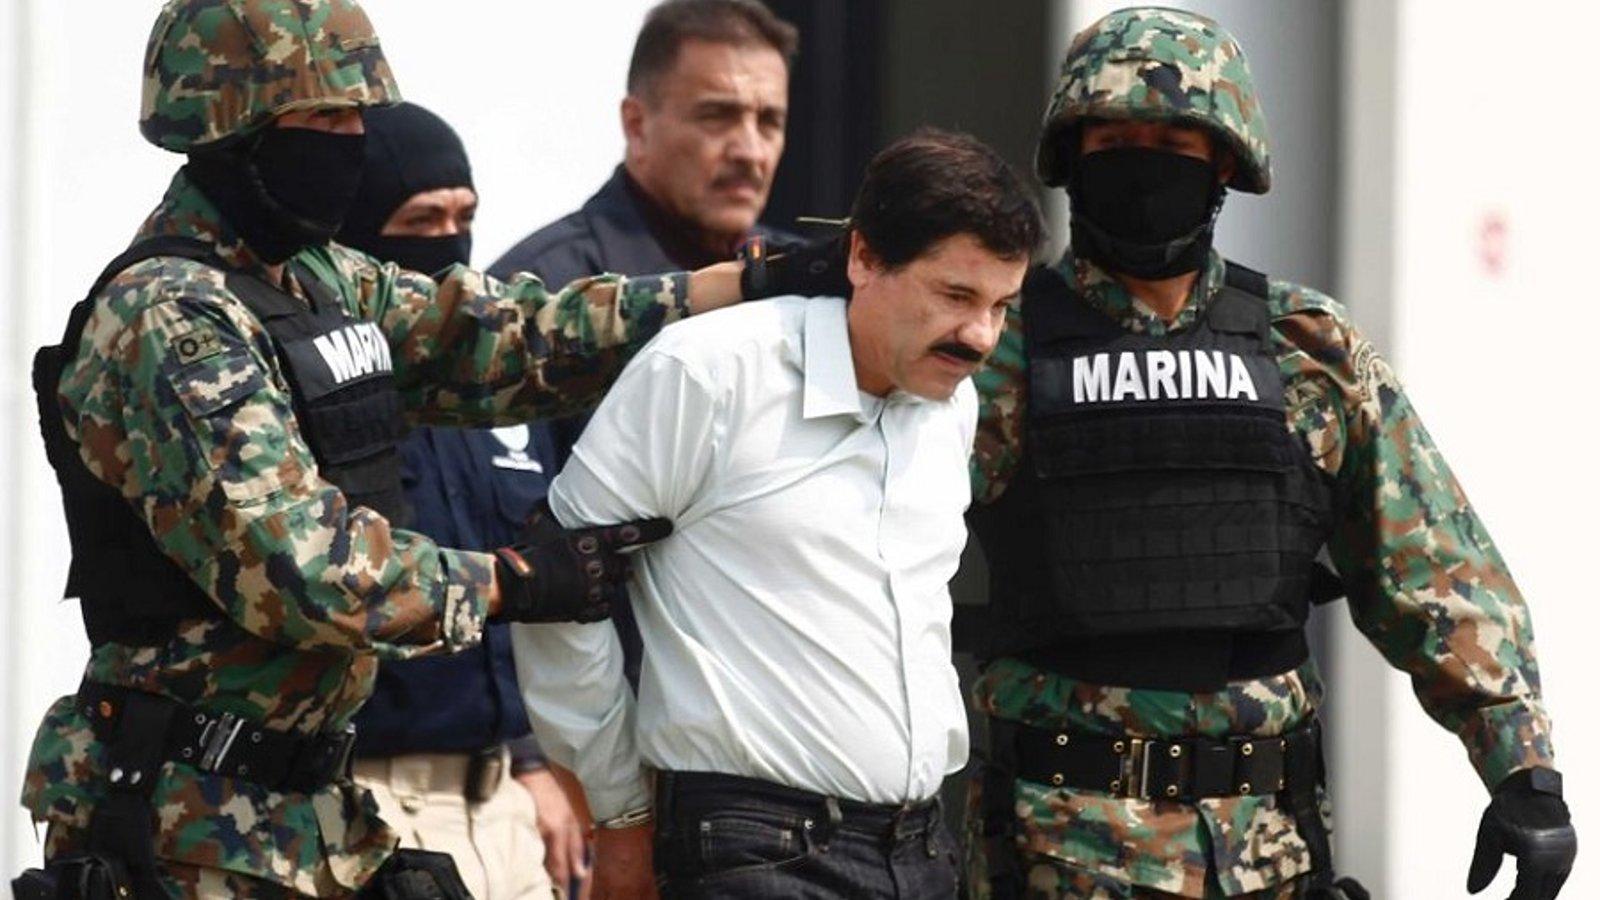 Es el Chapo - The Arrest of a Notorious Drug Kingpin